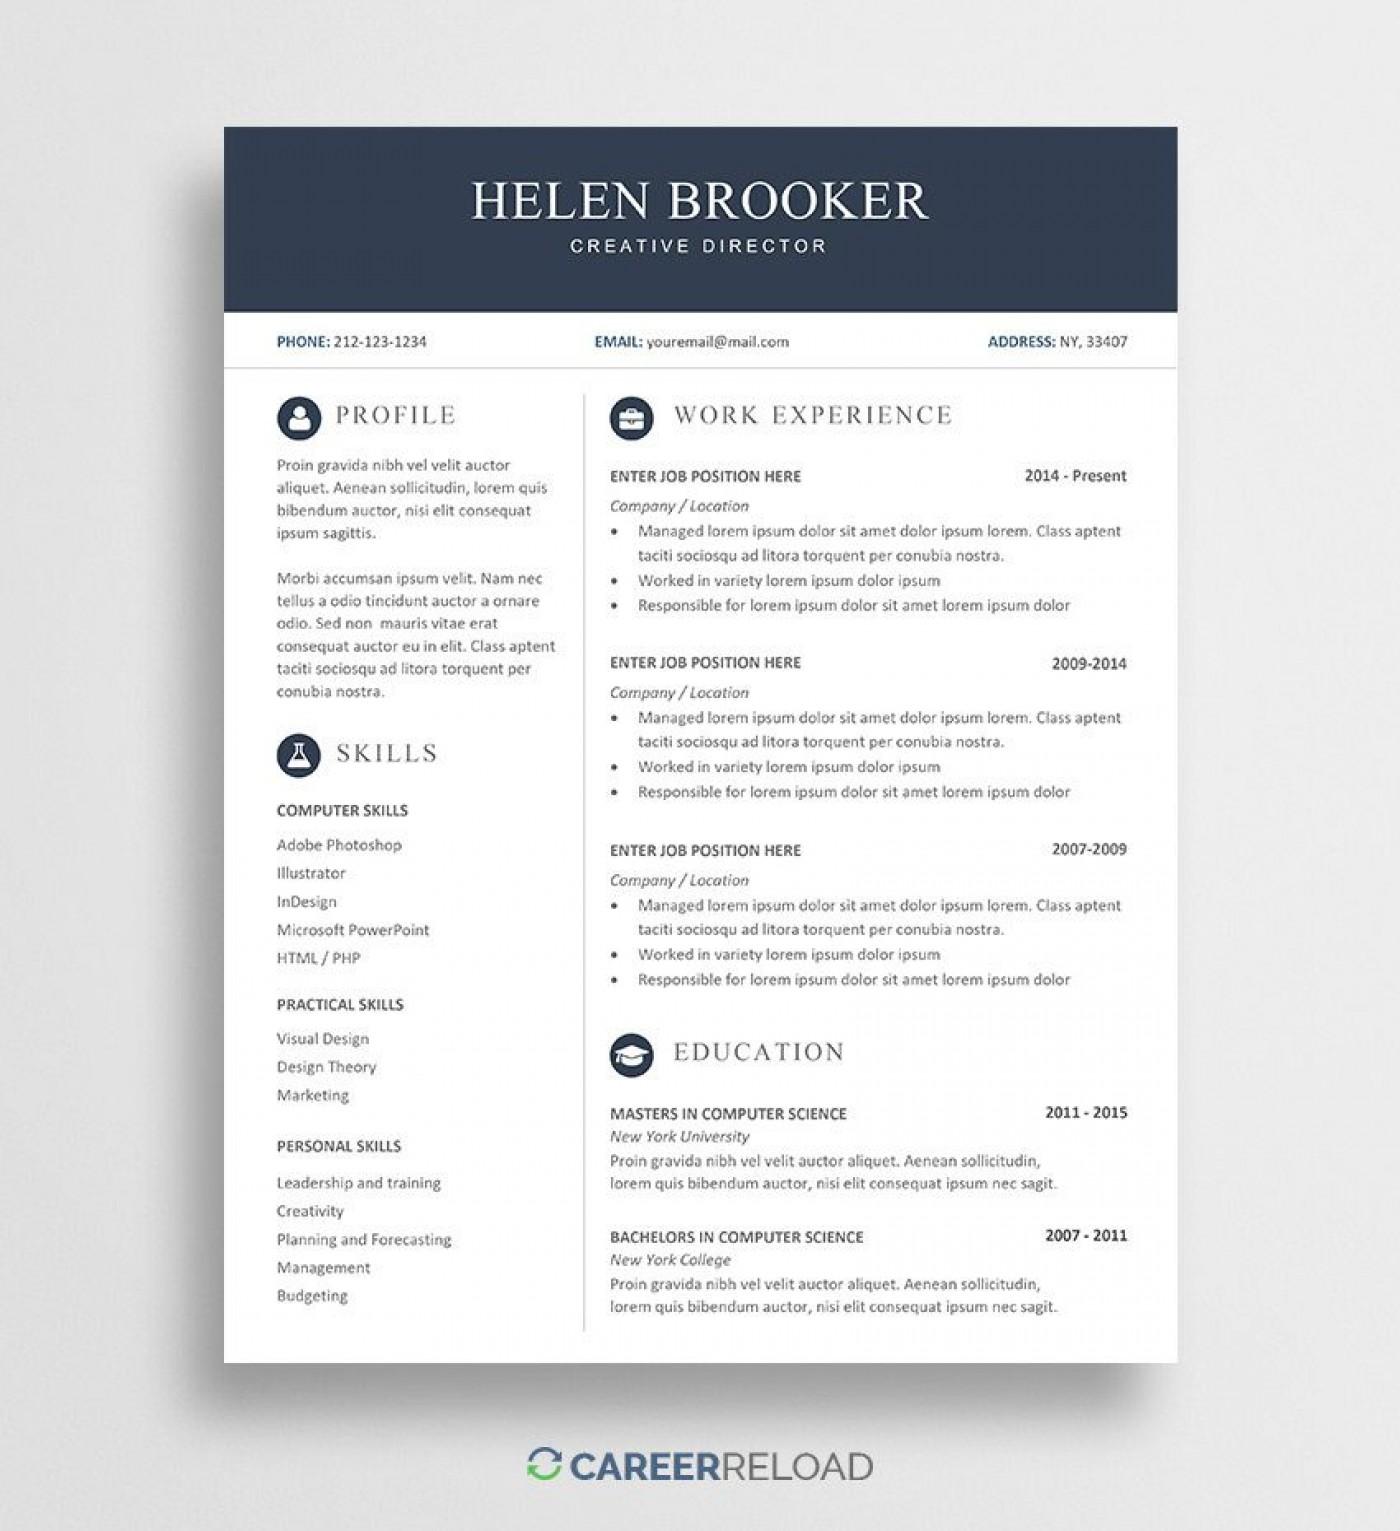 002 Wonderful Microsoft Word Resume Template Sample  Reddit 2019 2010 Free Download1400